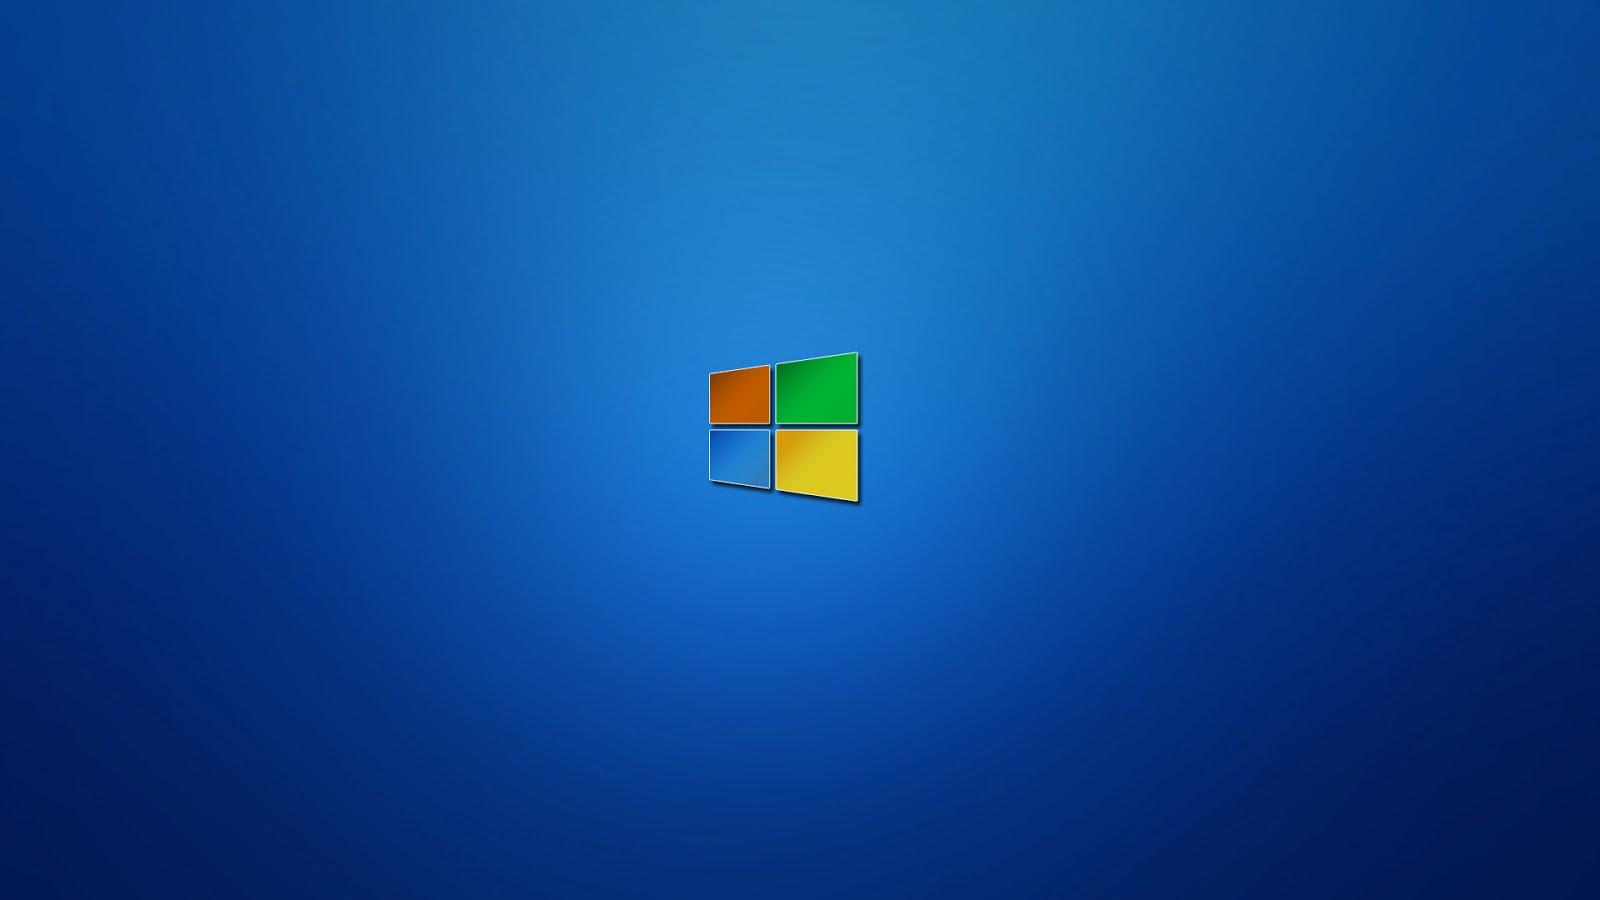 Windows Hd Backgrounds